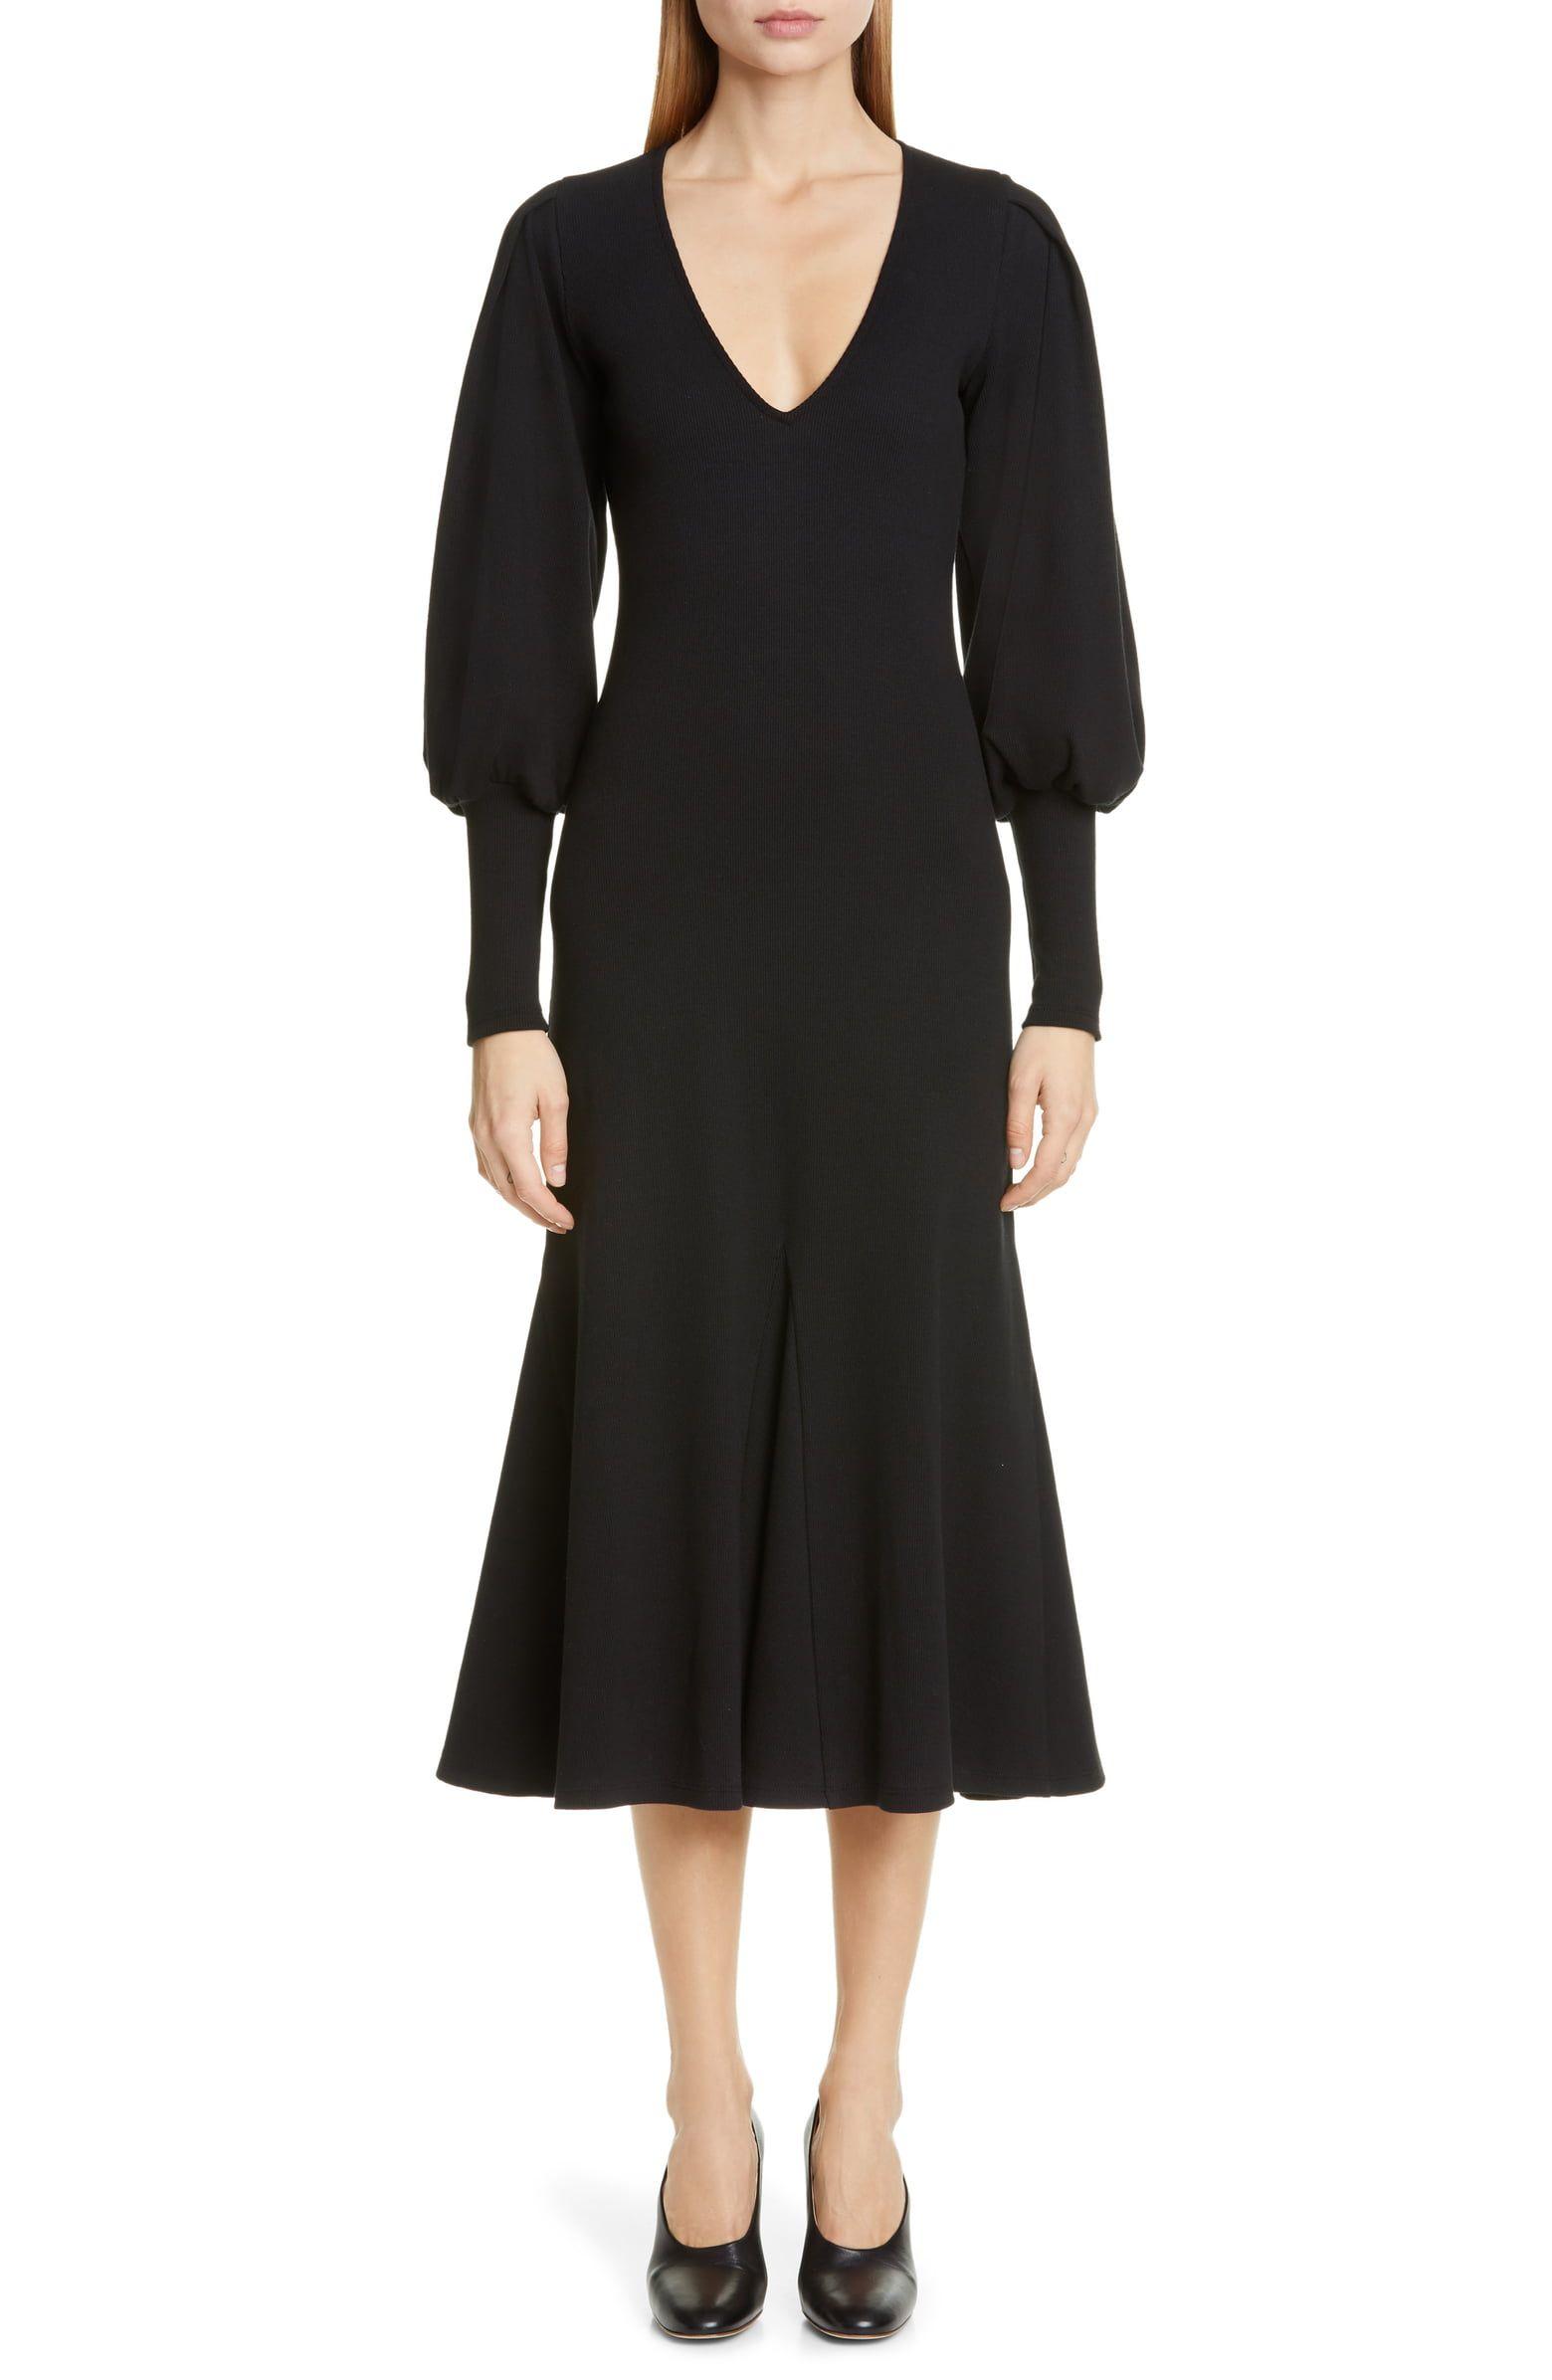 Beaufille Flora Long Sleeve Midi Dress Nordstrom Long Sleeve Midi Dress Black Long Sleeve Midi Dress Long Sleeve Midi [ 2392 x 1560 Pixel ]